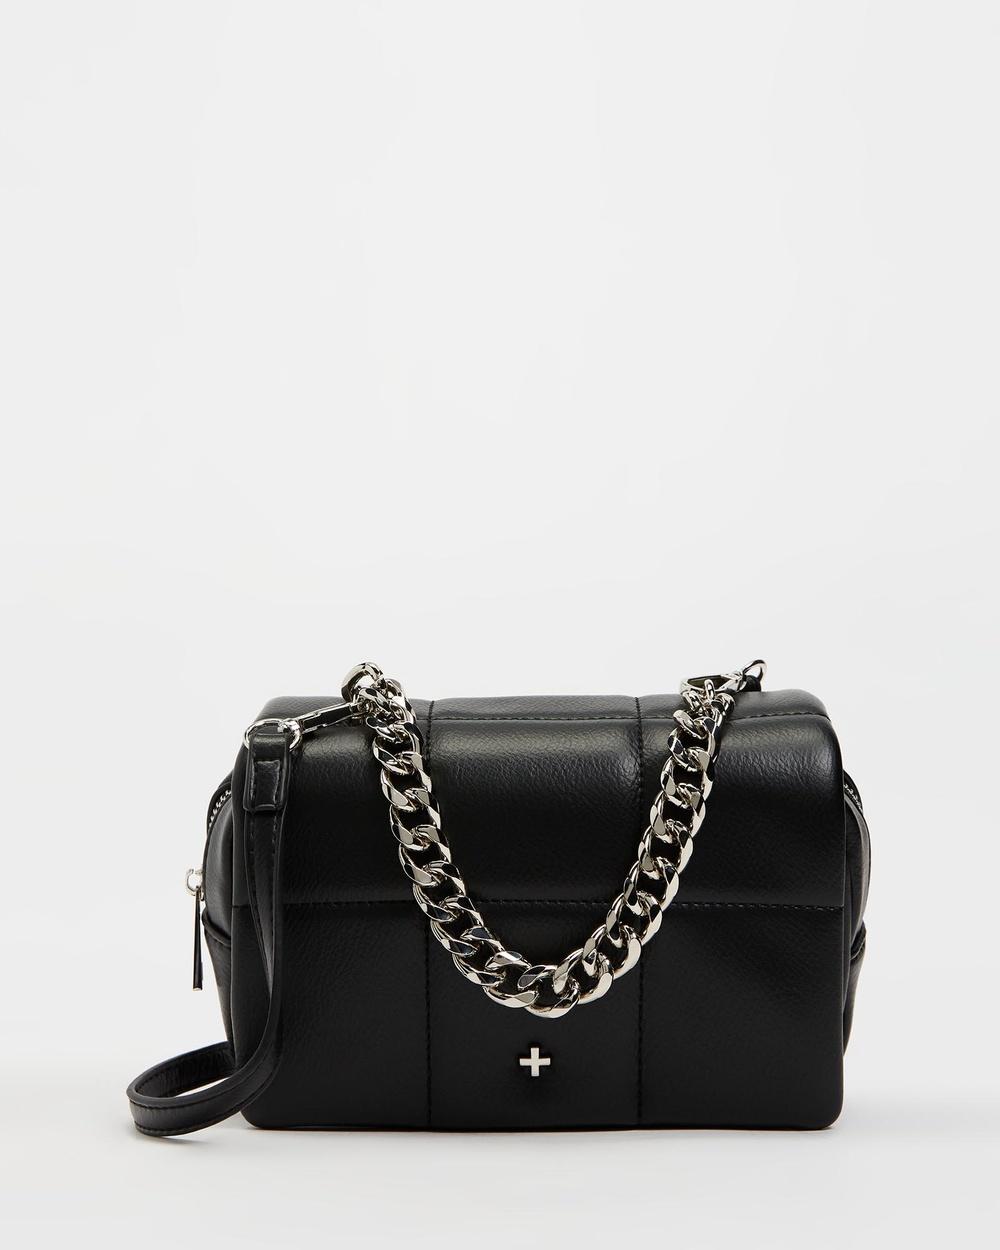 PETA AND JAIN Carter Cross Body Bag Bags Black & Silver Cross-Body